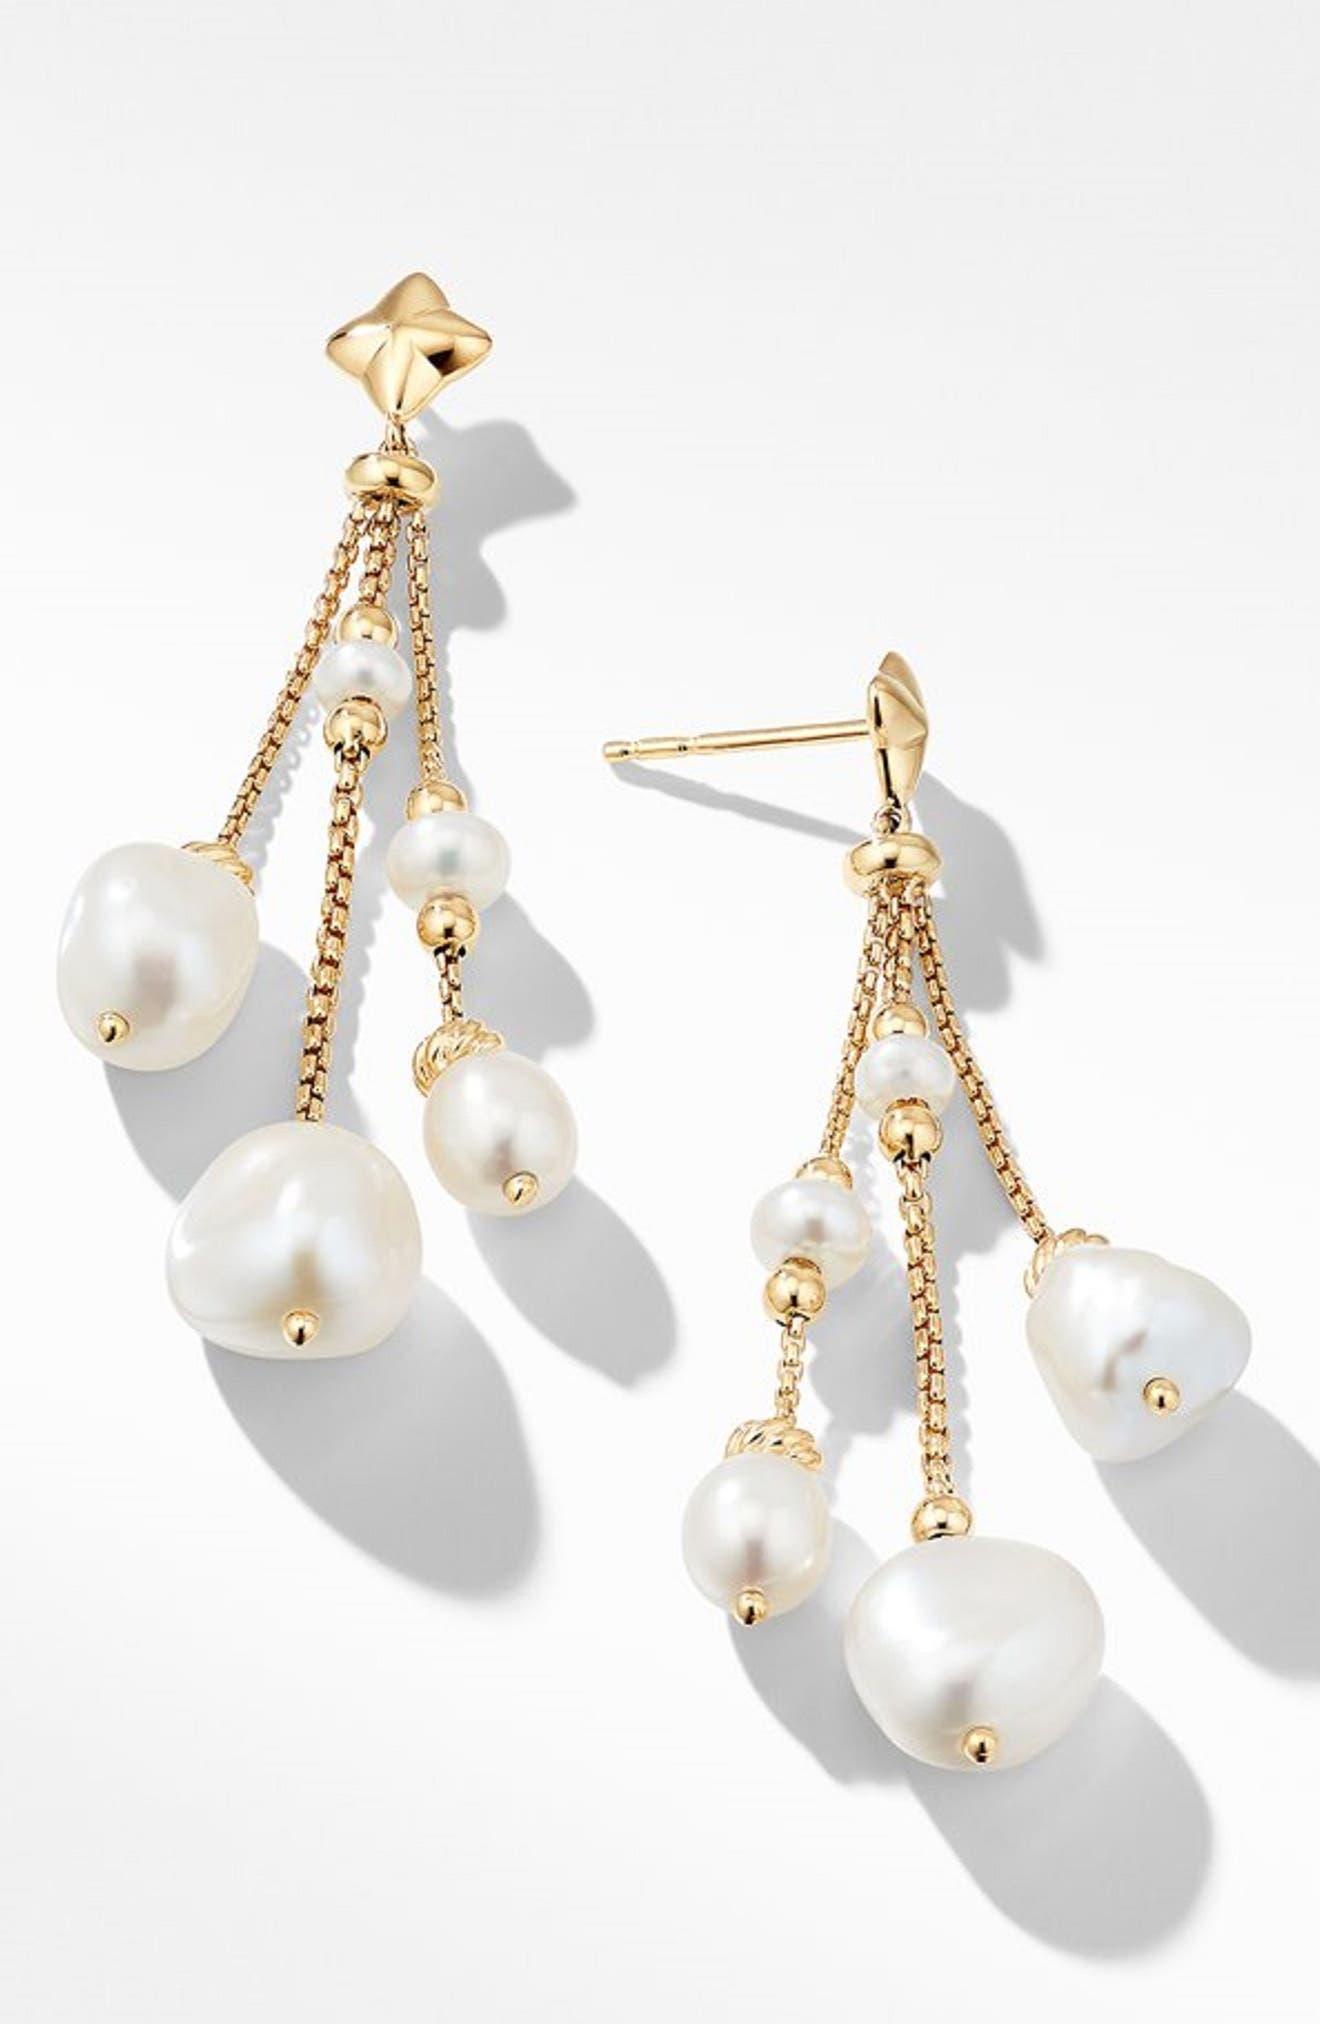 Bijoux Bead Link Drop Earrings in 18K Gold,                             Main thumbnail 1, color,                             PEARL